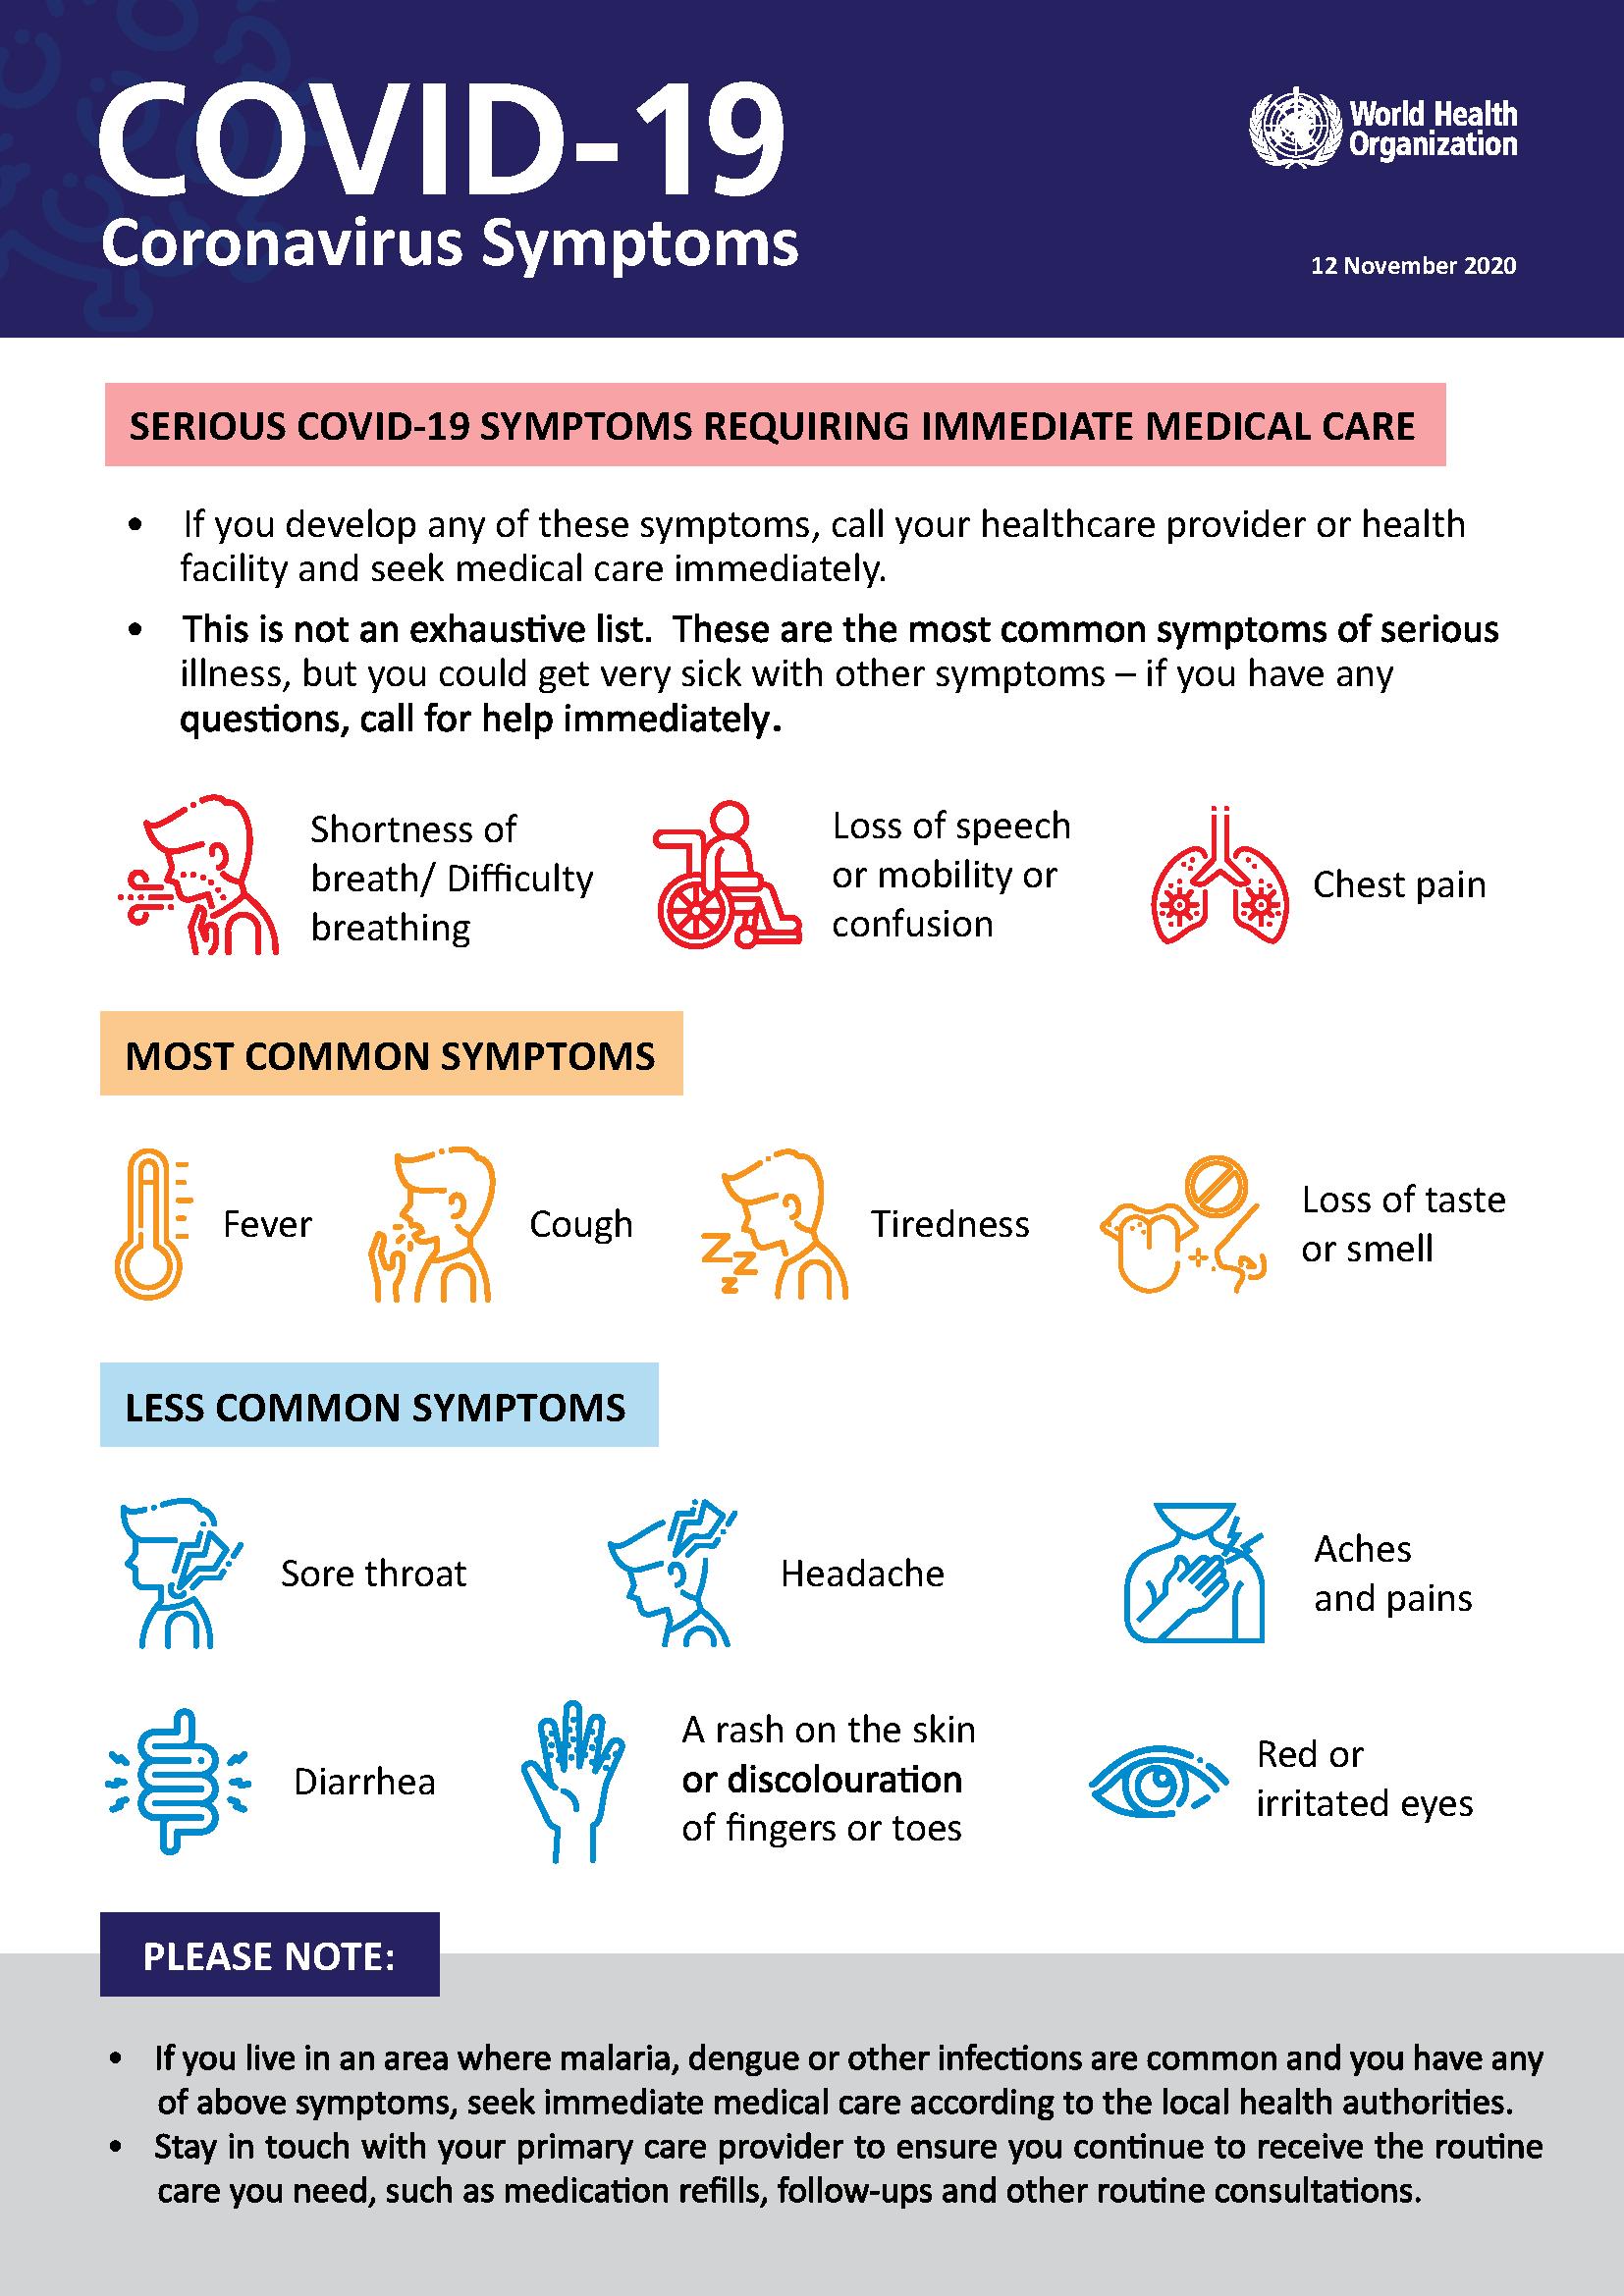 COVID19_Infographic_symptoms_FINAL